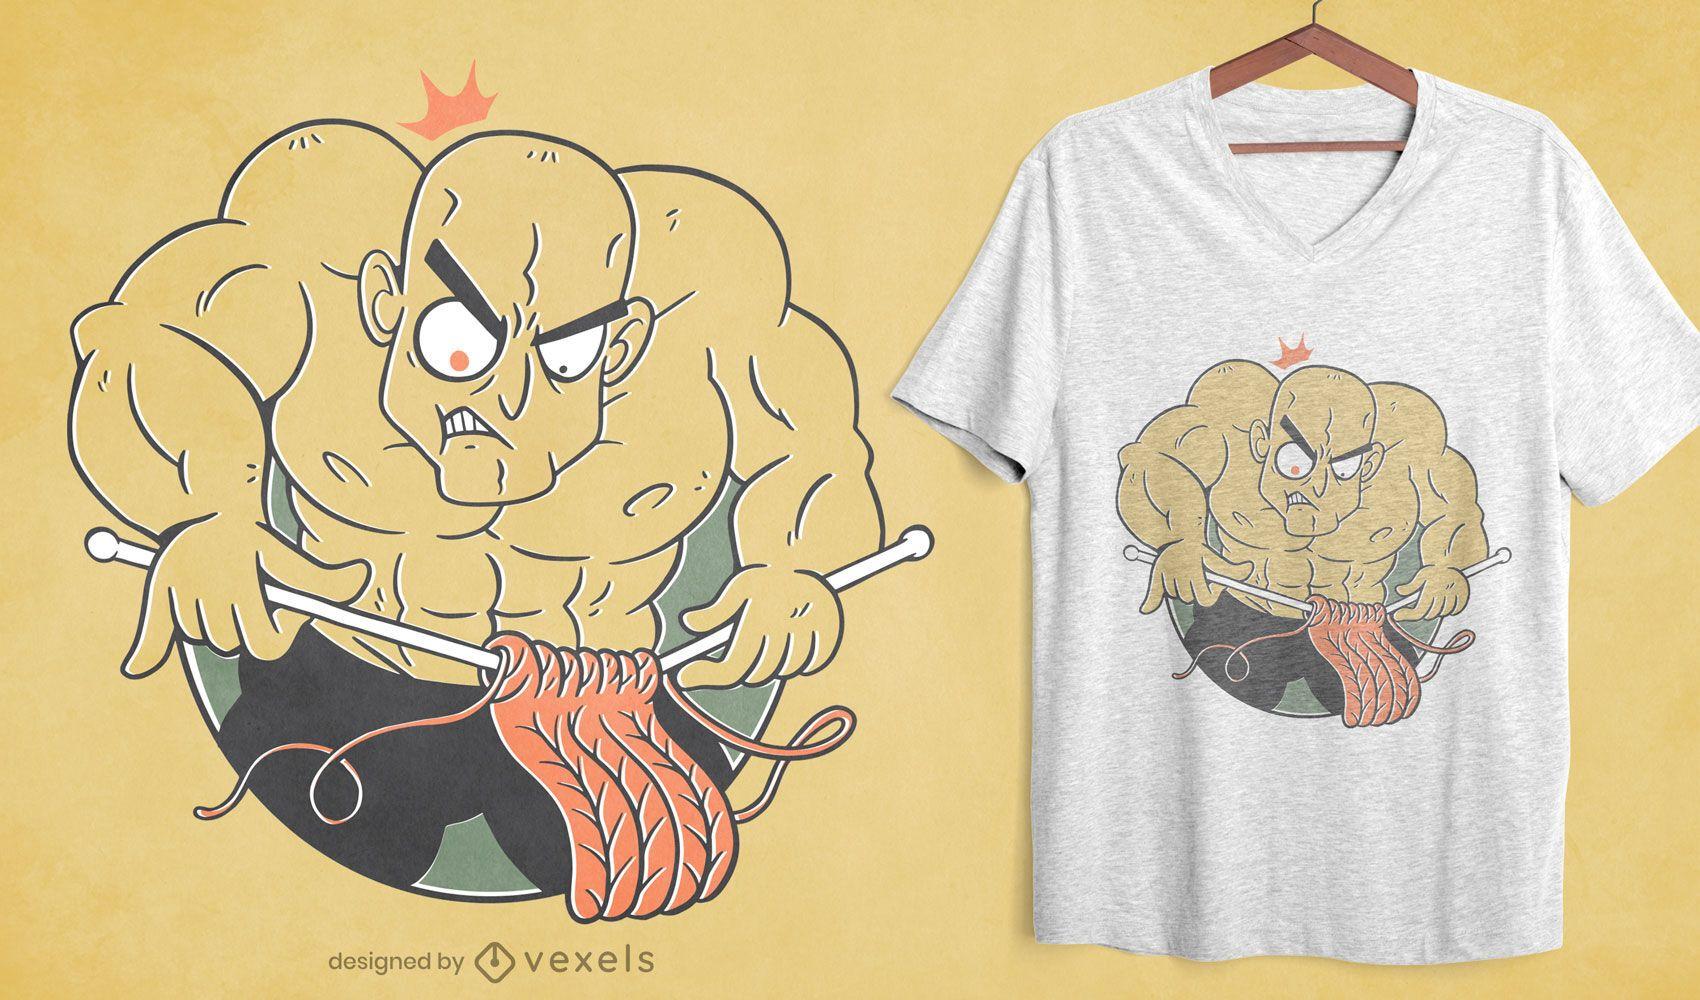 Bodybuilder man knitting t-shirt design